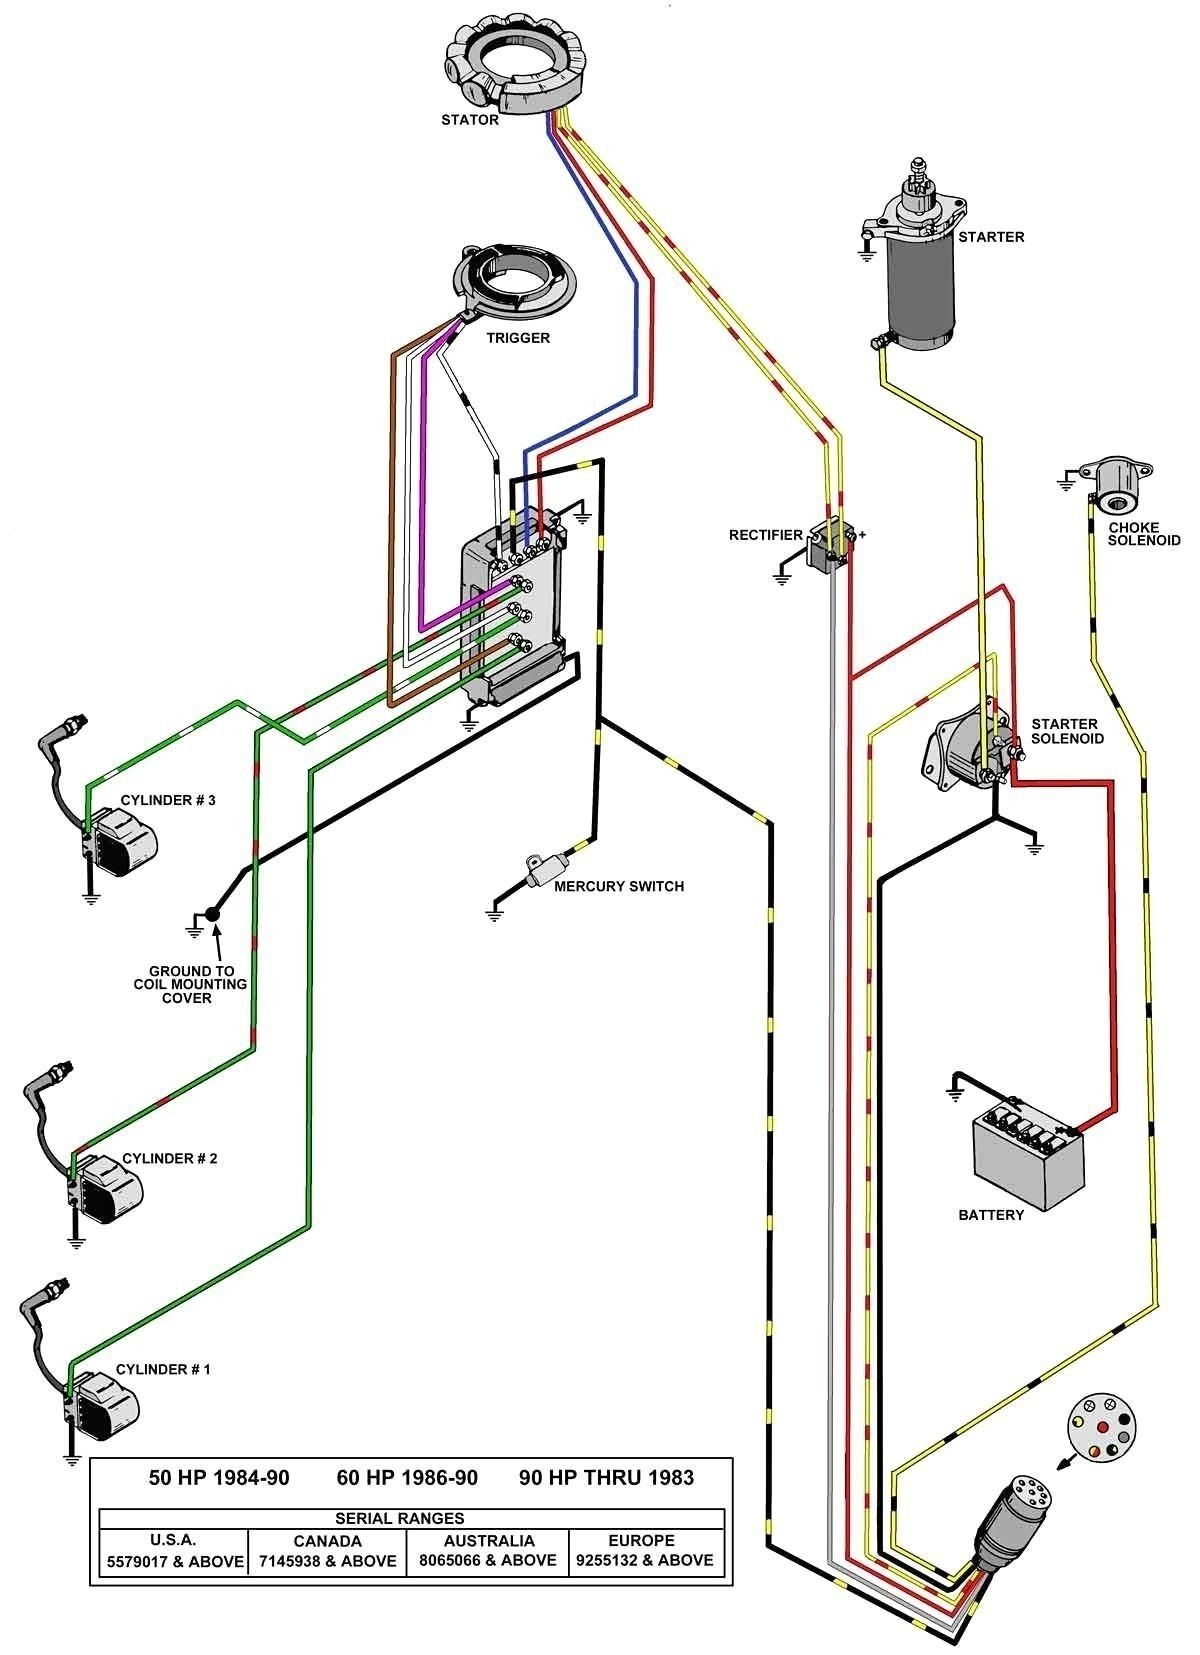 Inspirational Mercury Control Box Wiring Diagram